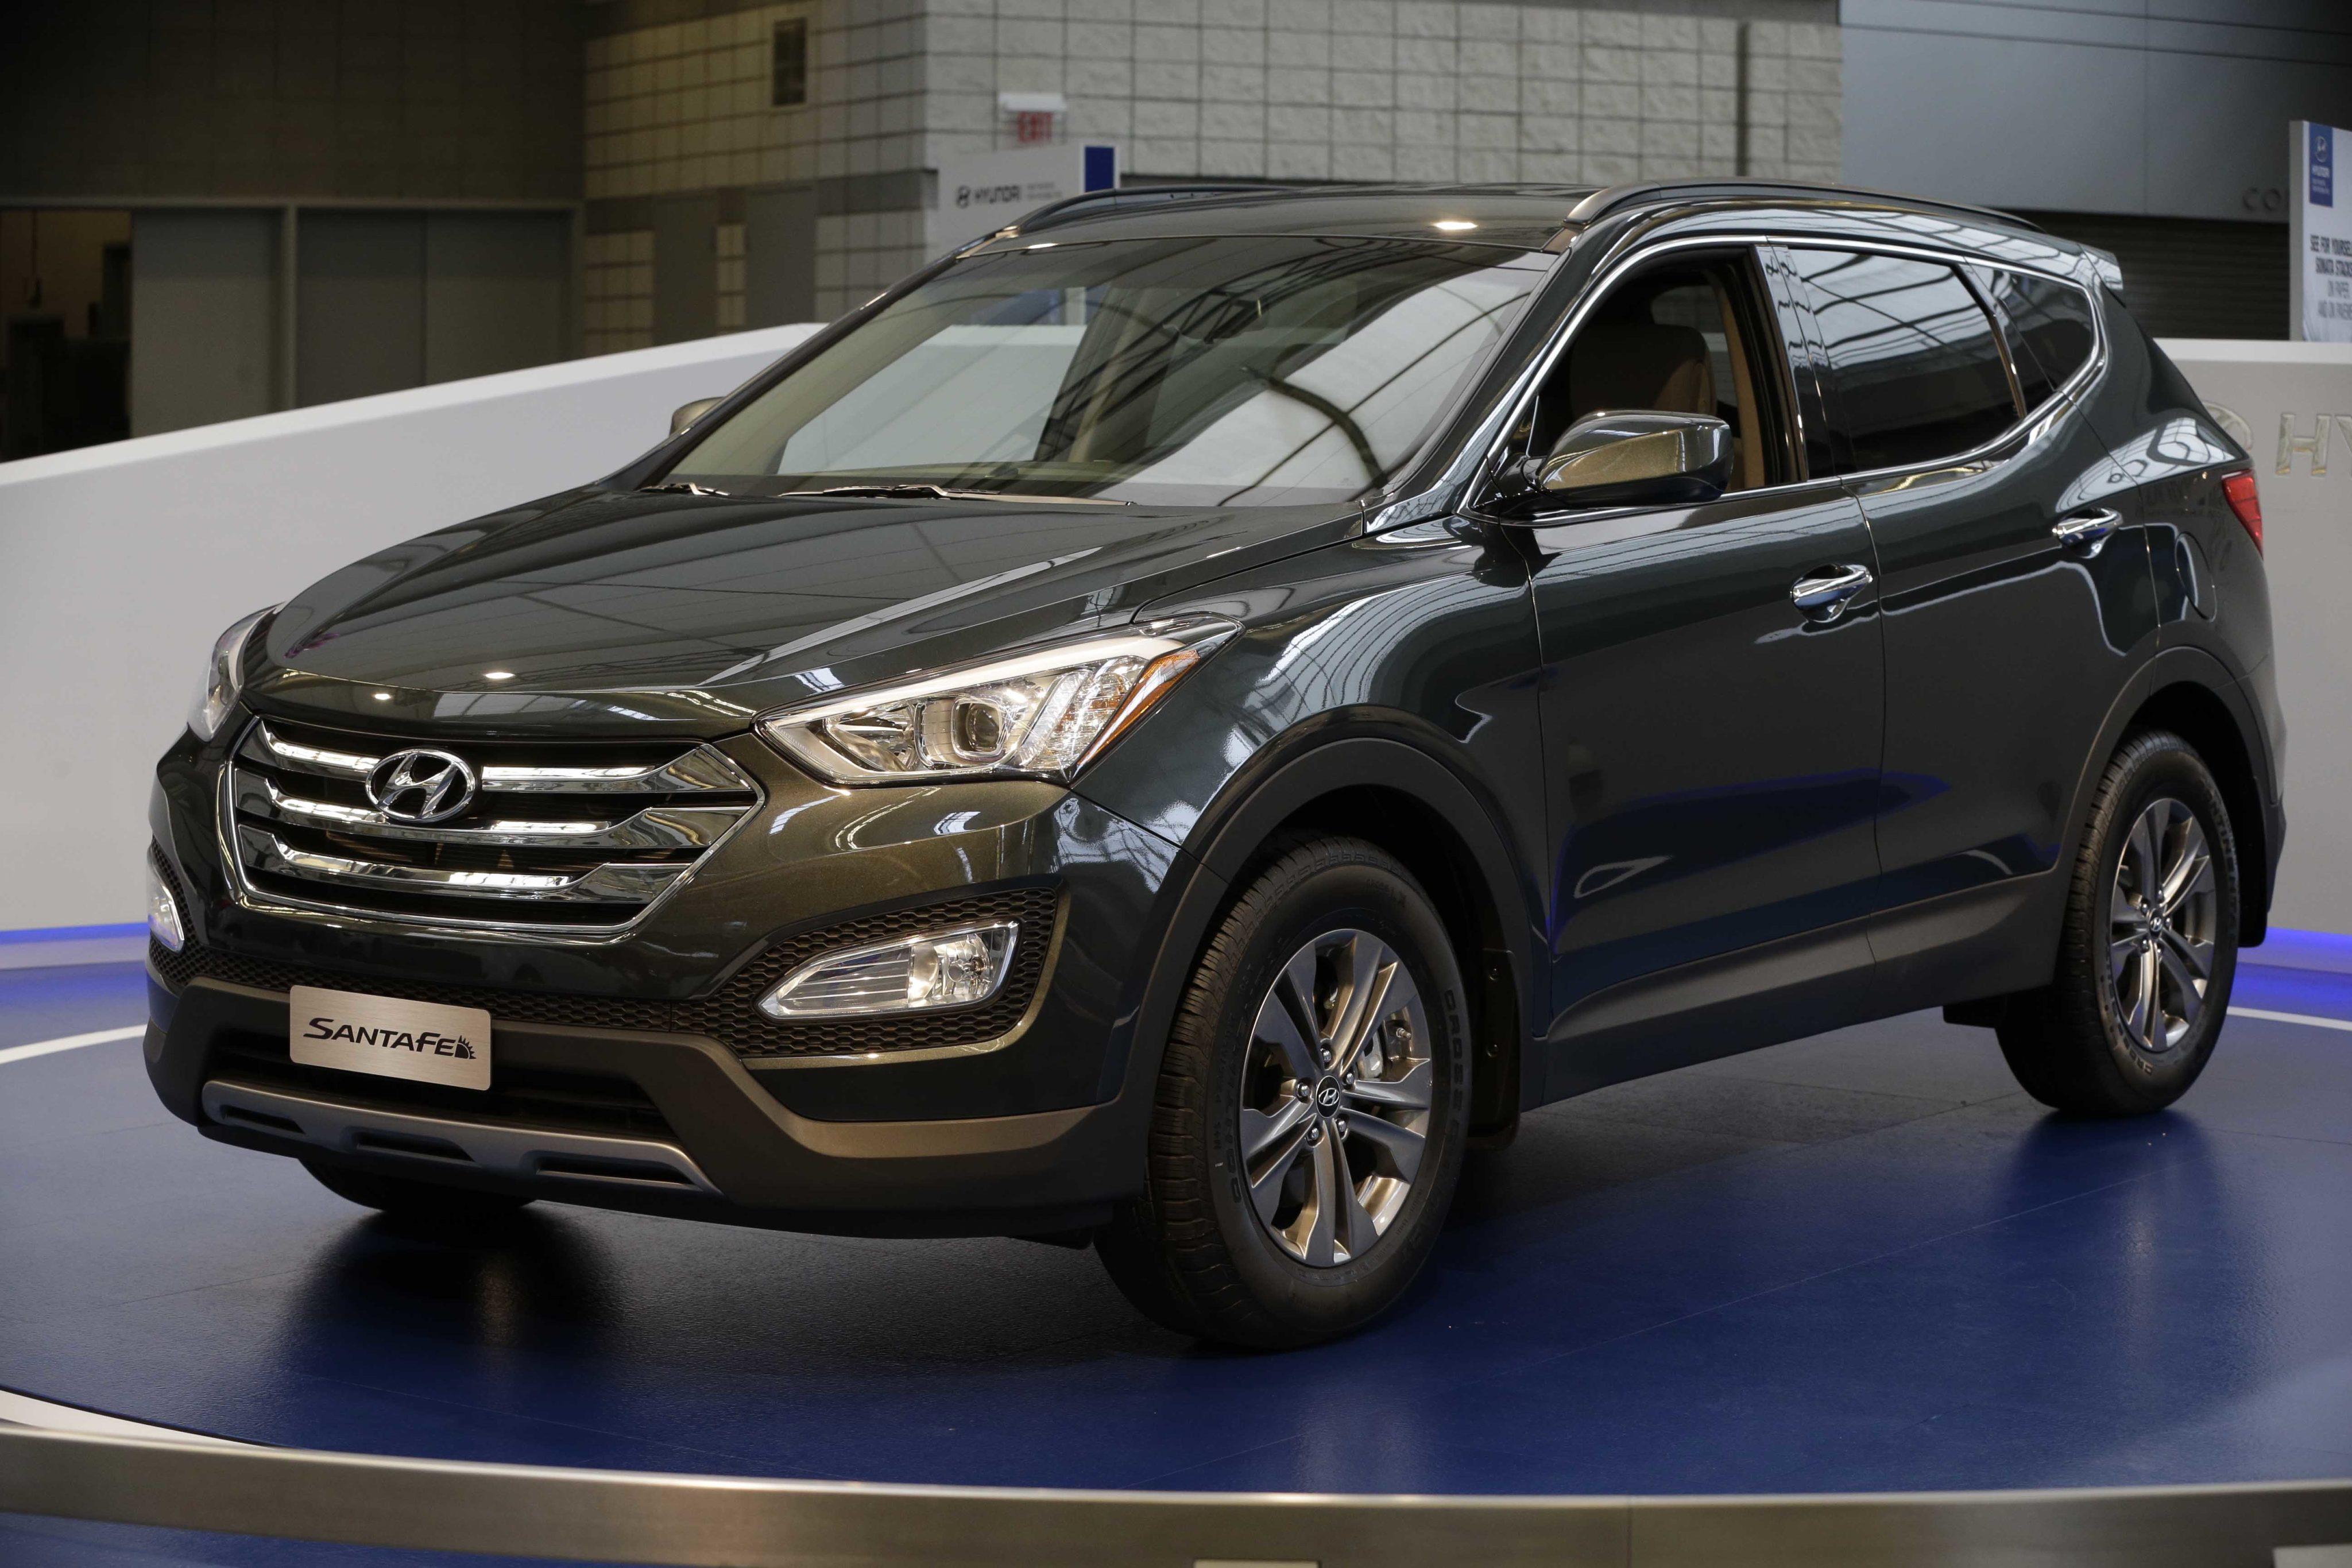 Hyundai recalls vehicles to fix hood latches, warning lights